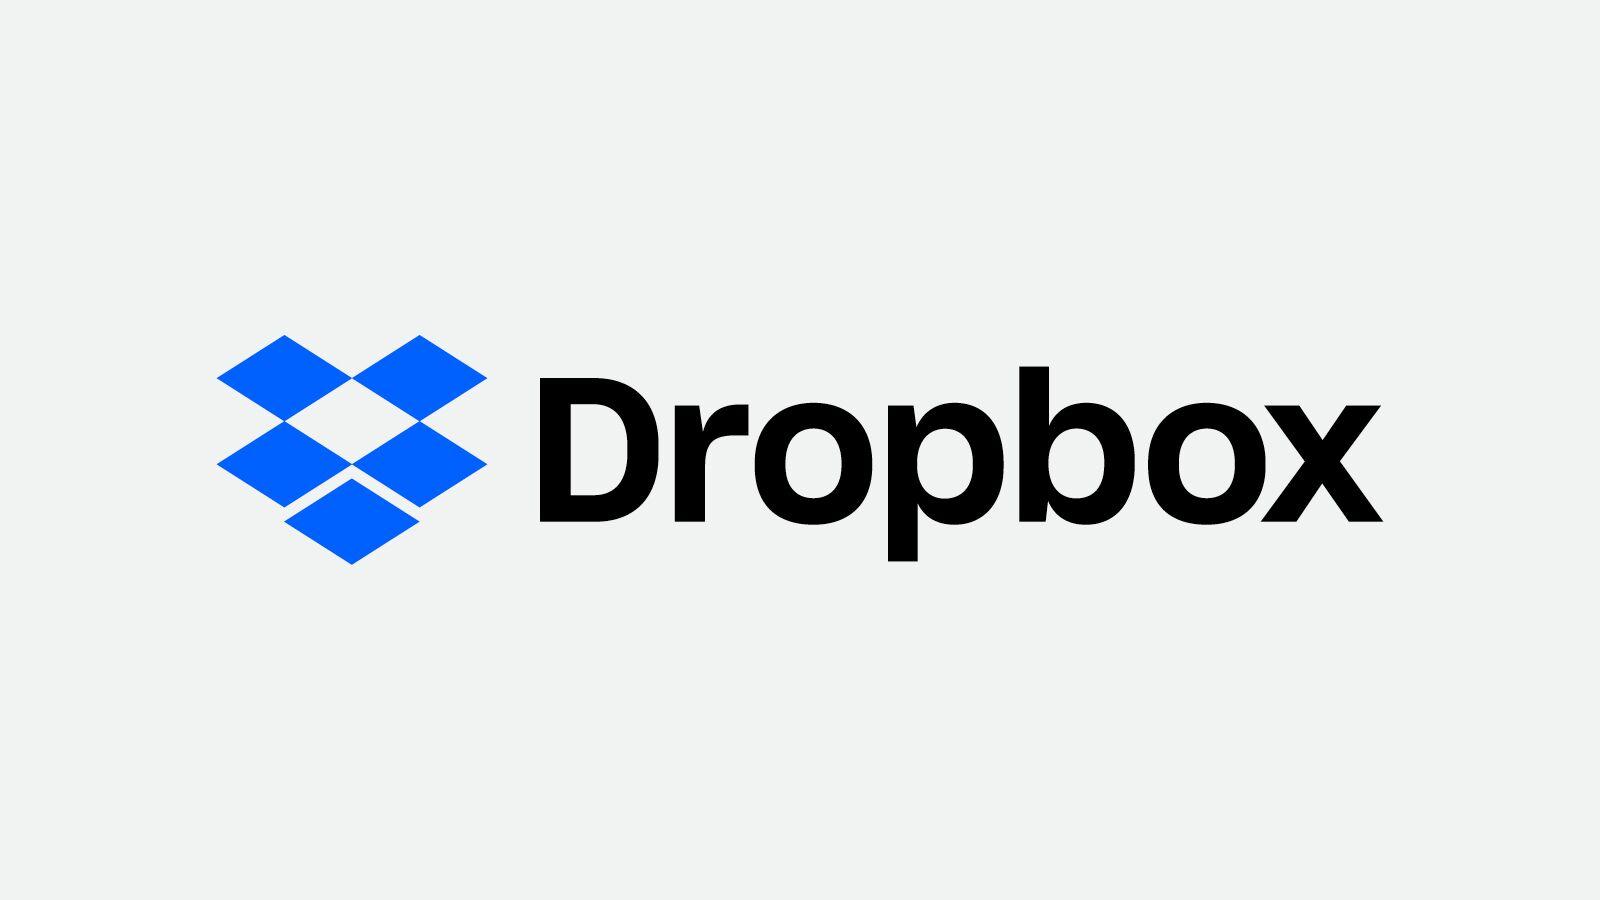 Mac OS - Hvordan ha 2 Dropbox kontoer